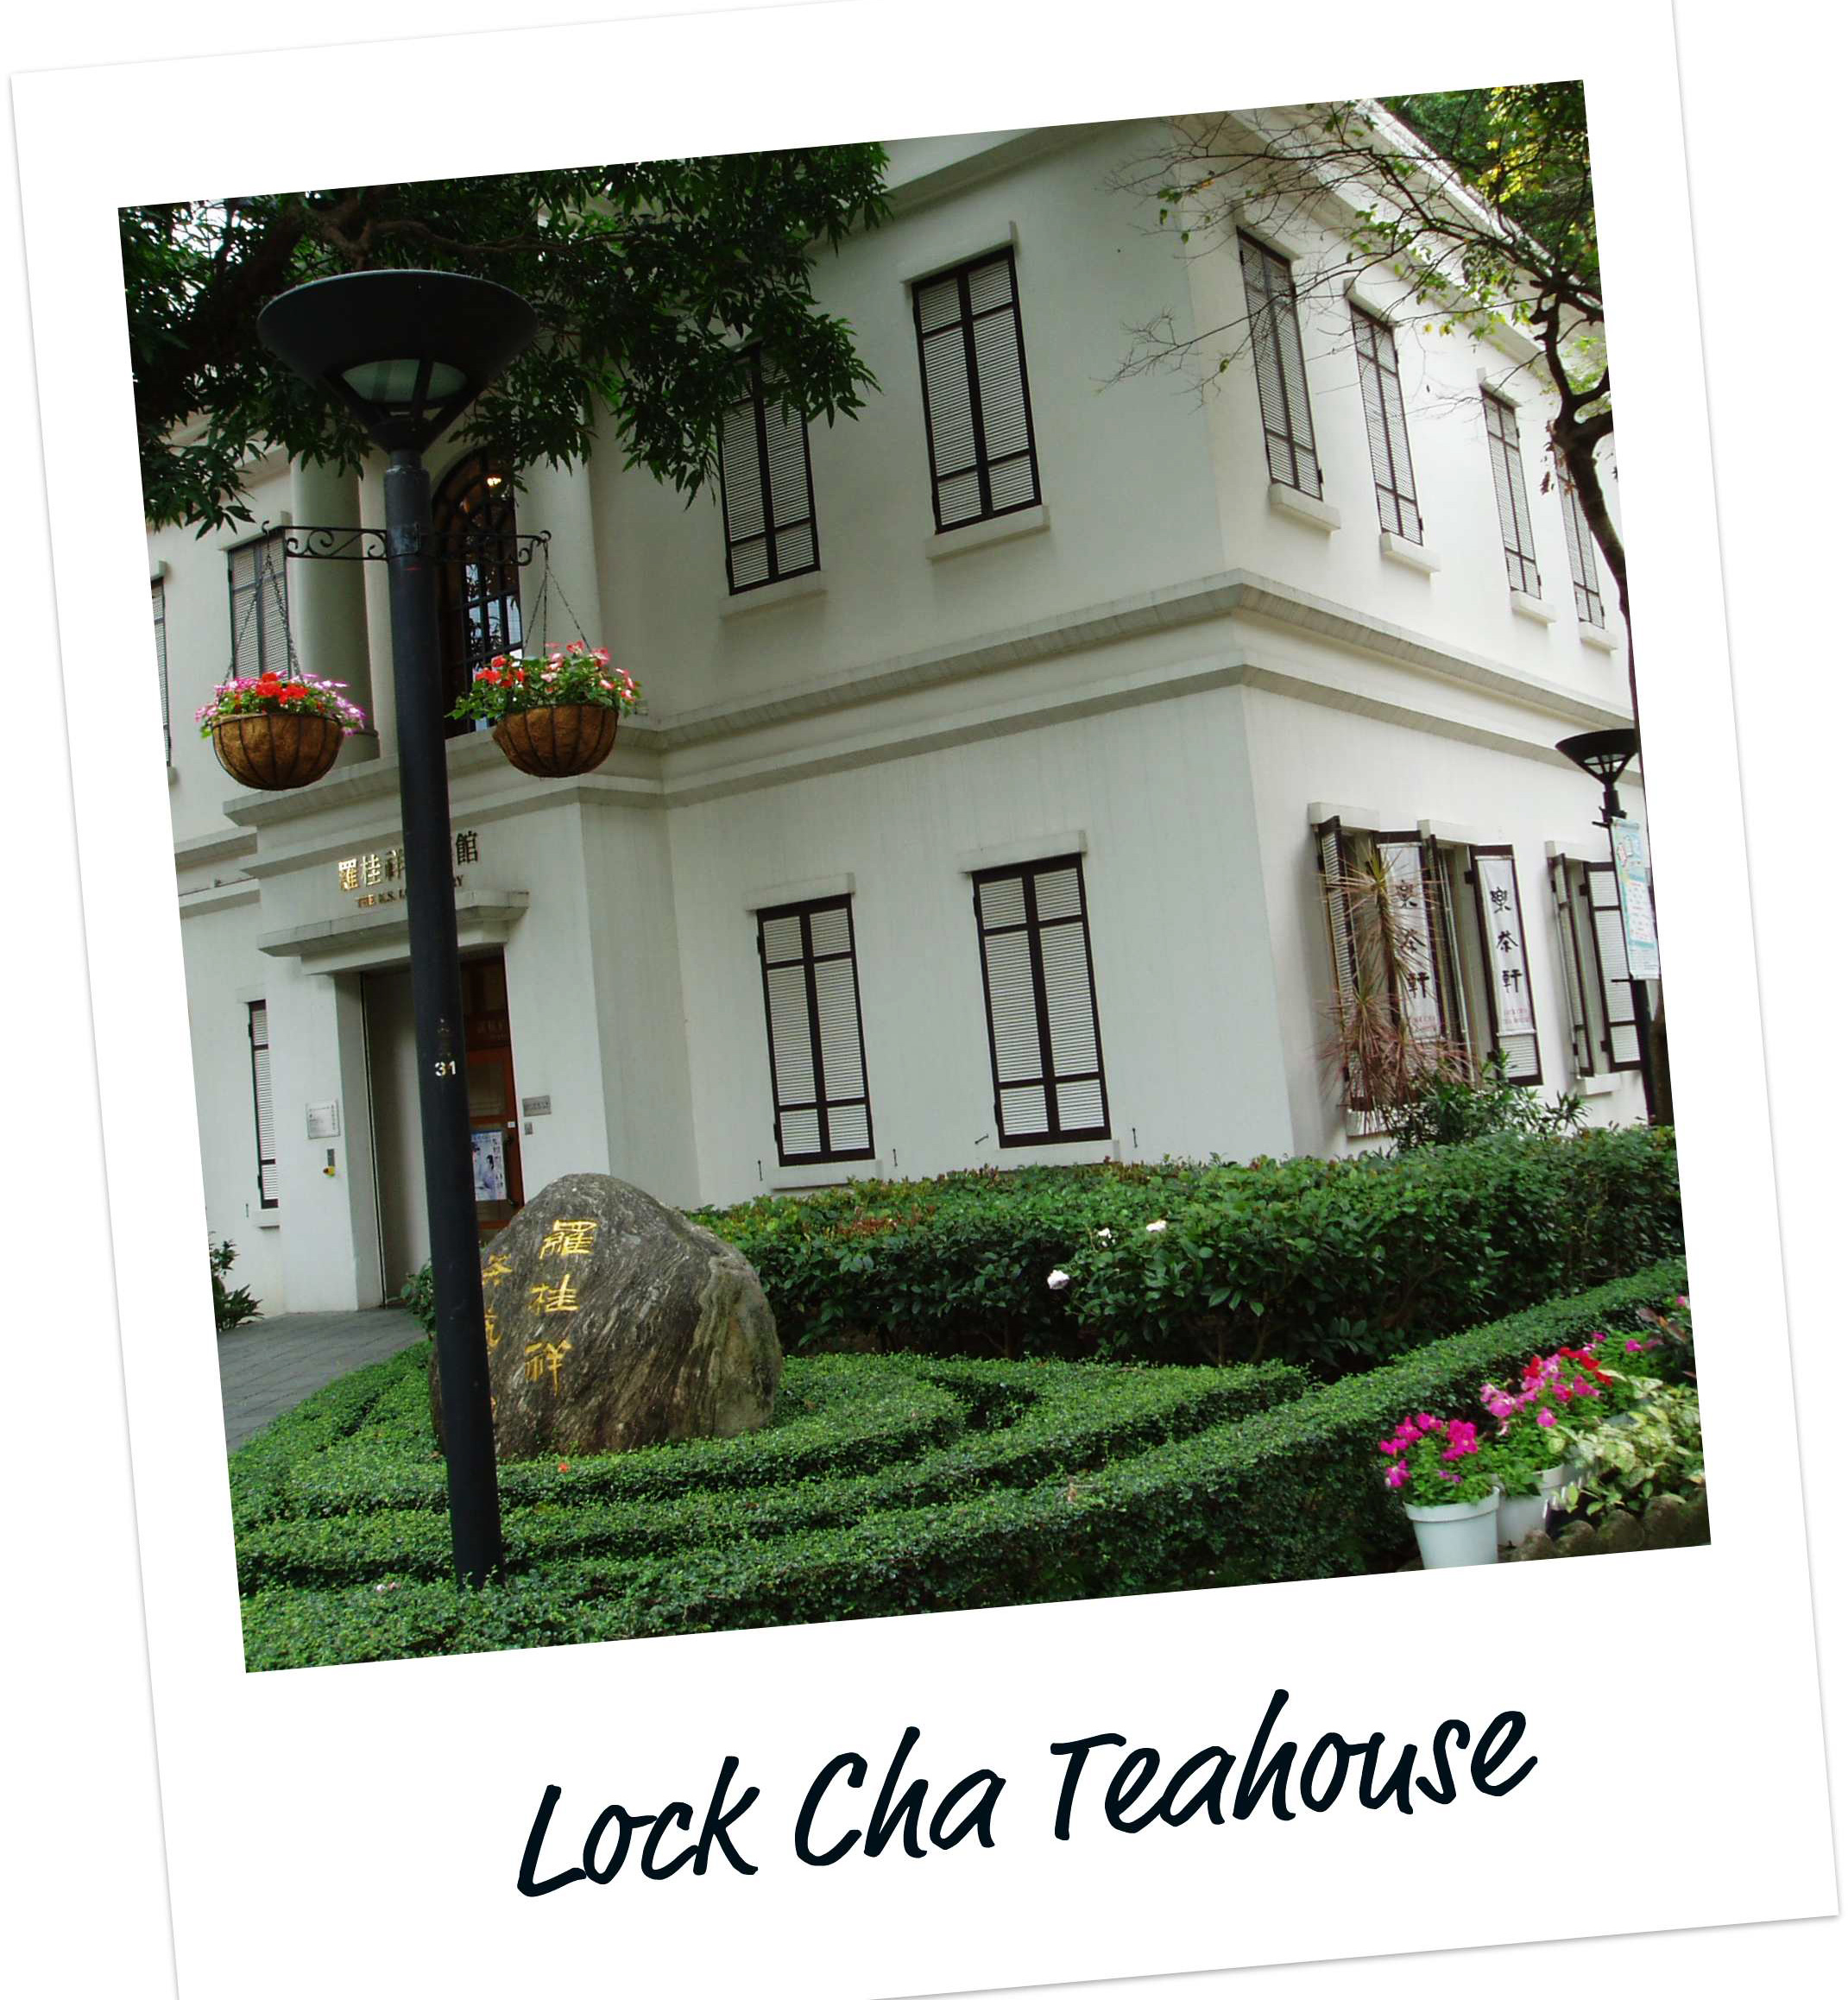 Lock Cha